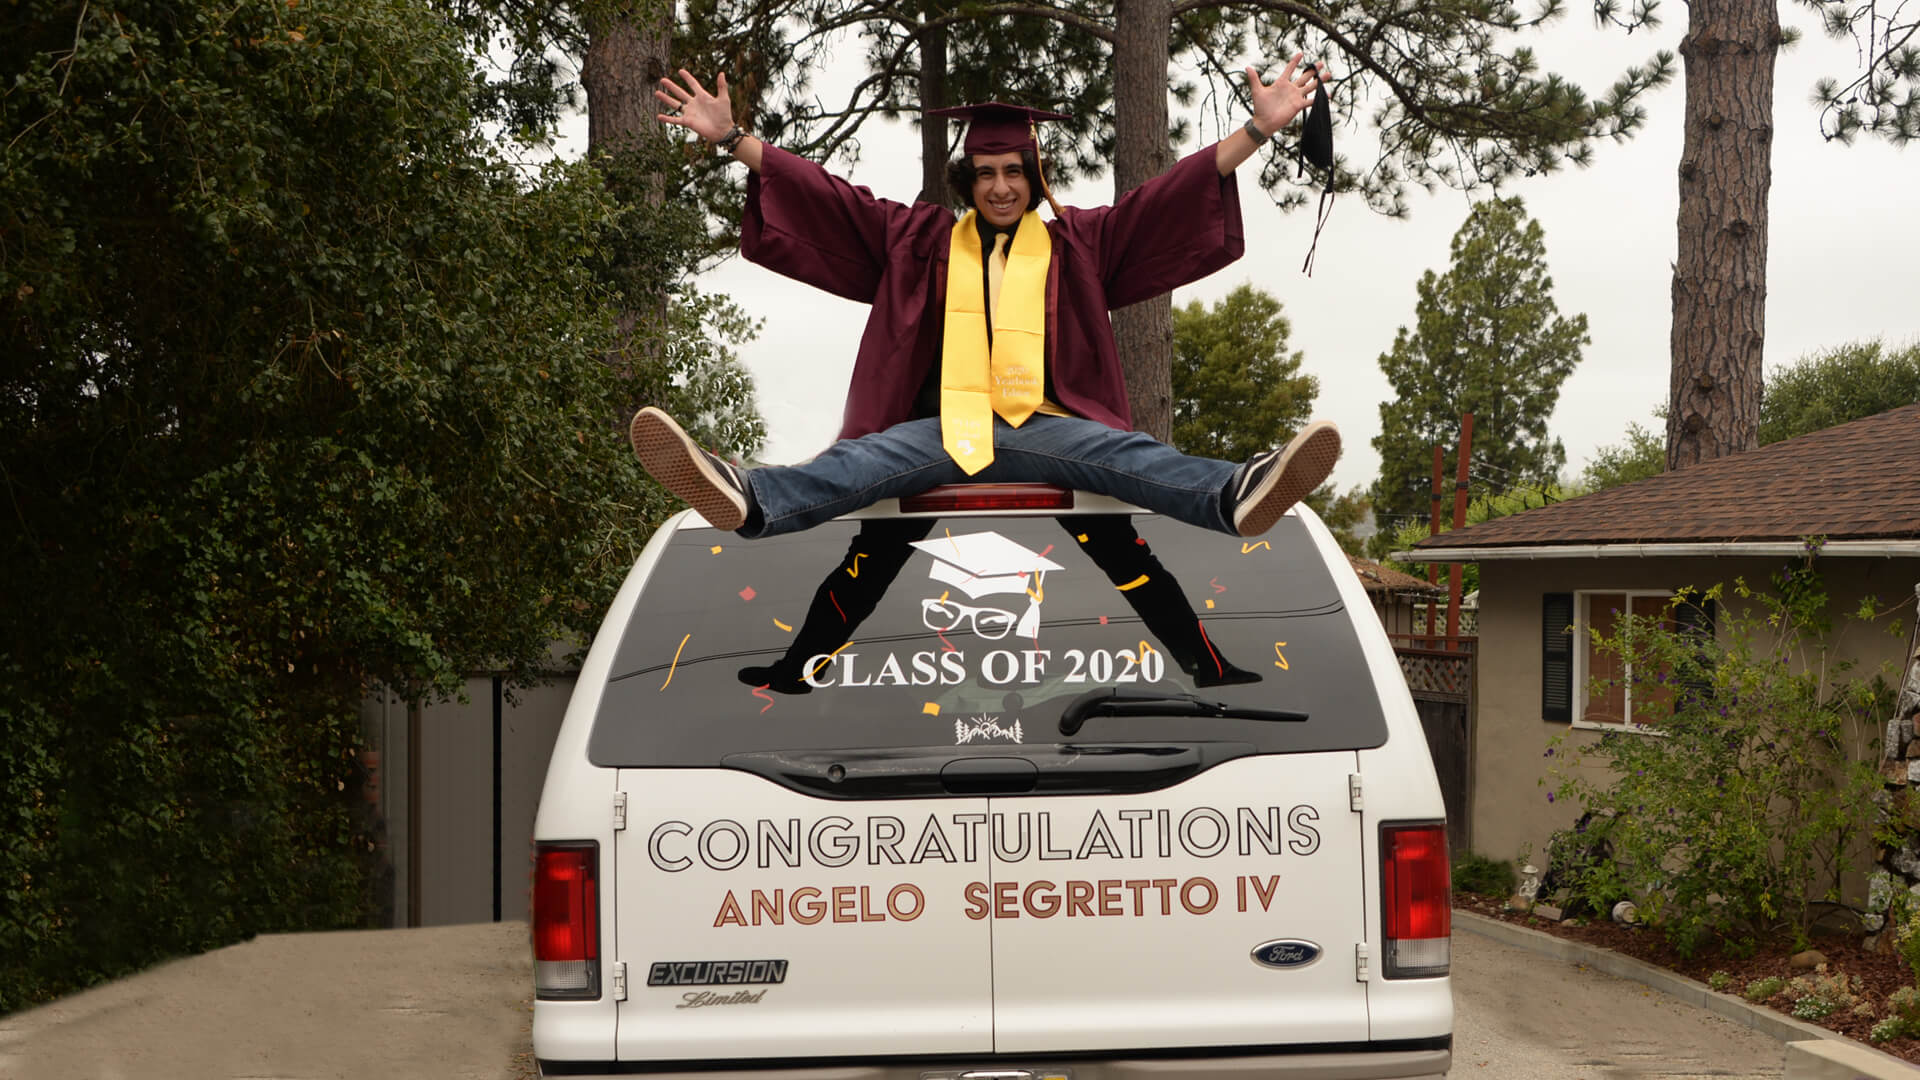 angelo graduation picture